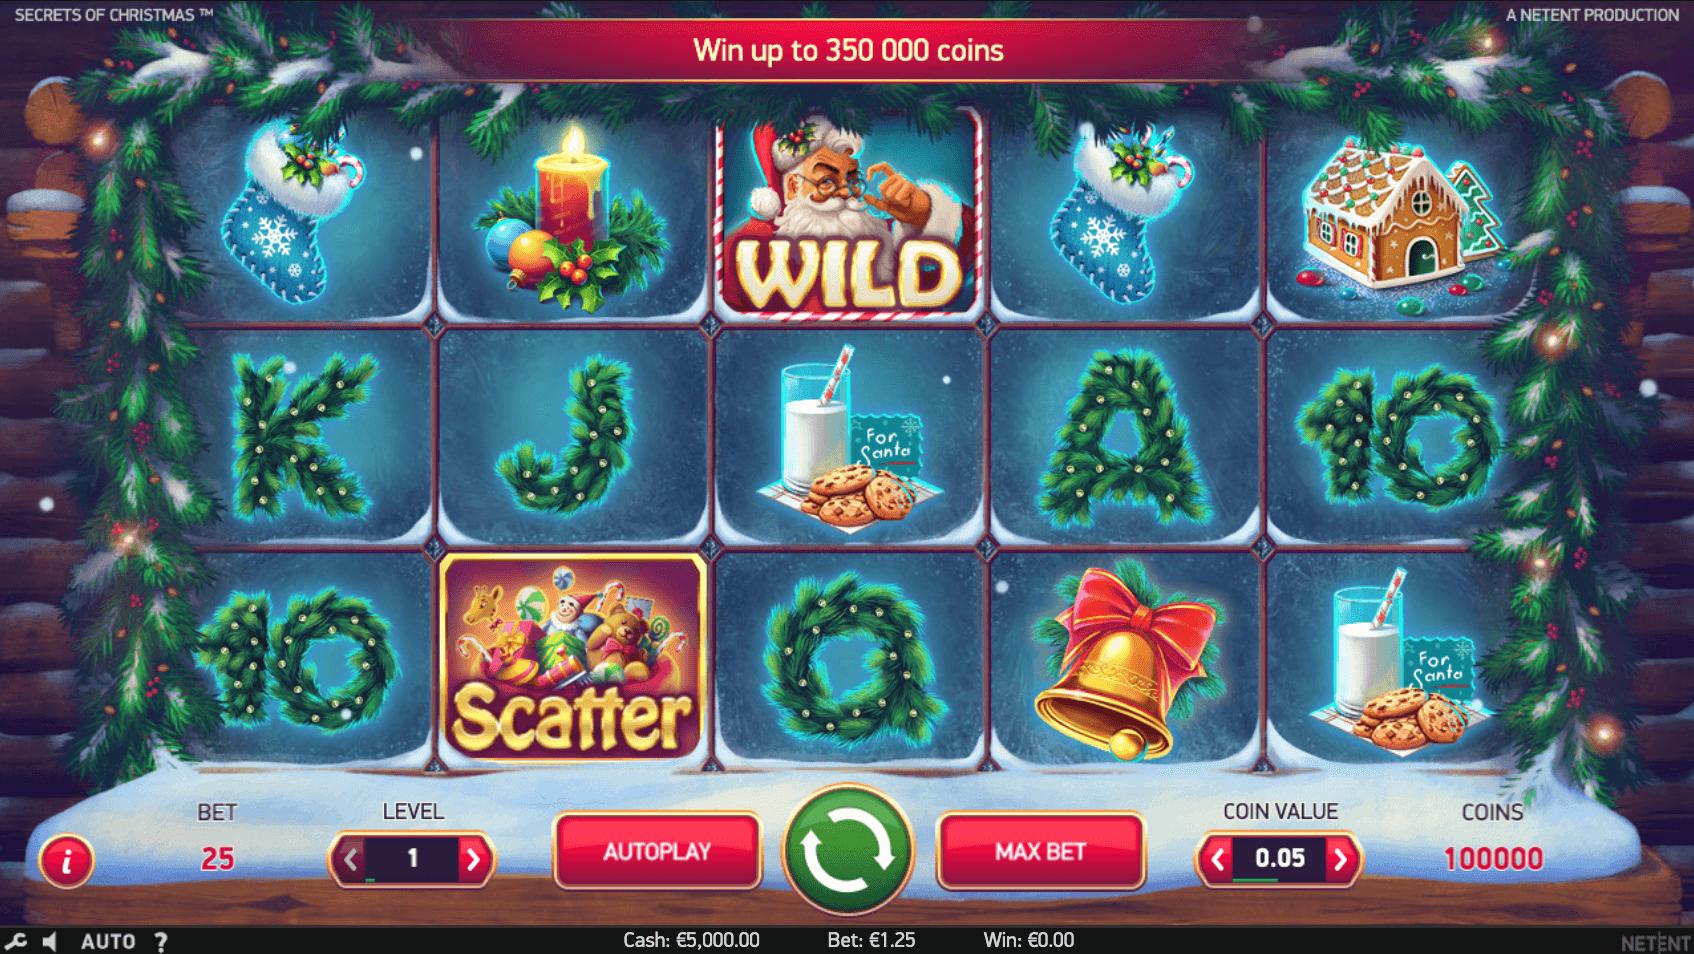 Screenshot from Secrets of Christmas NetEnt slot